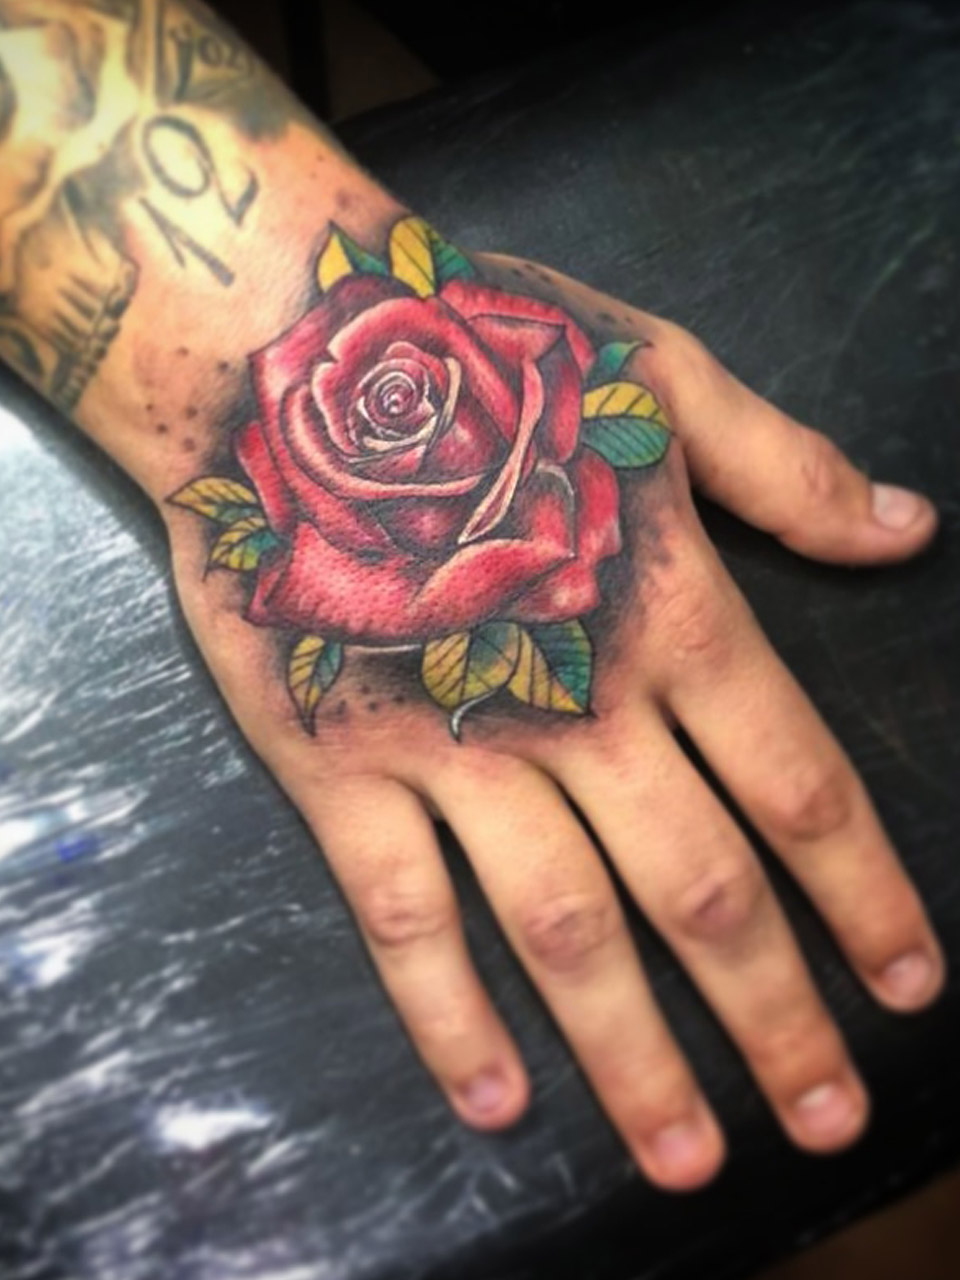 jose-andres-cardoso-tattoo-015-color-top-hand